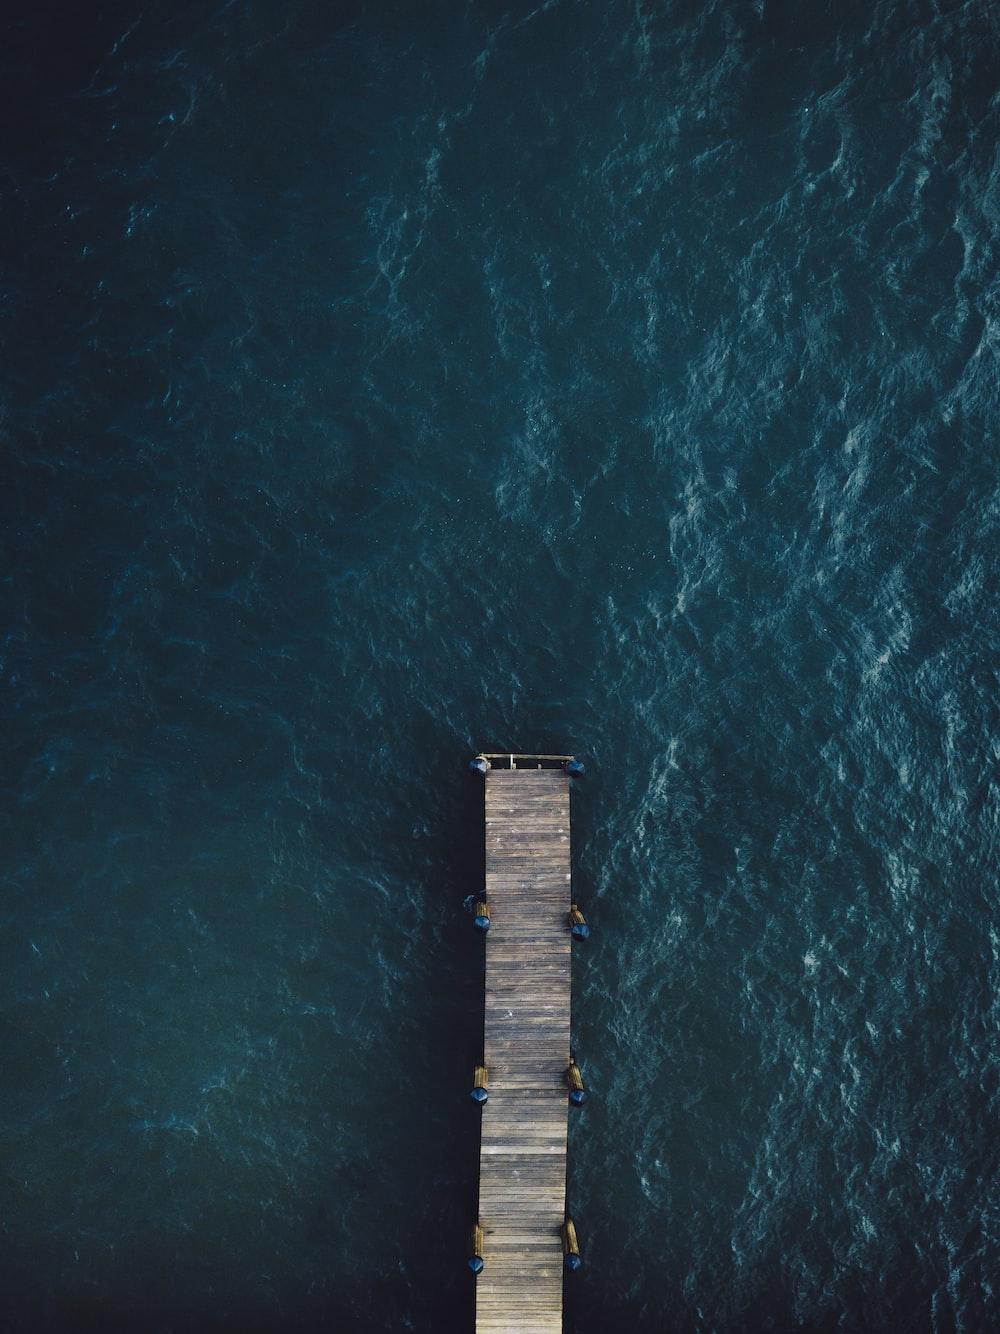 brown wooden bridge on body of water